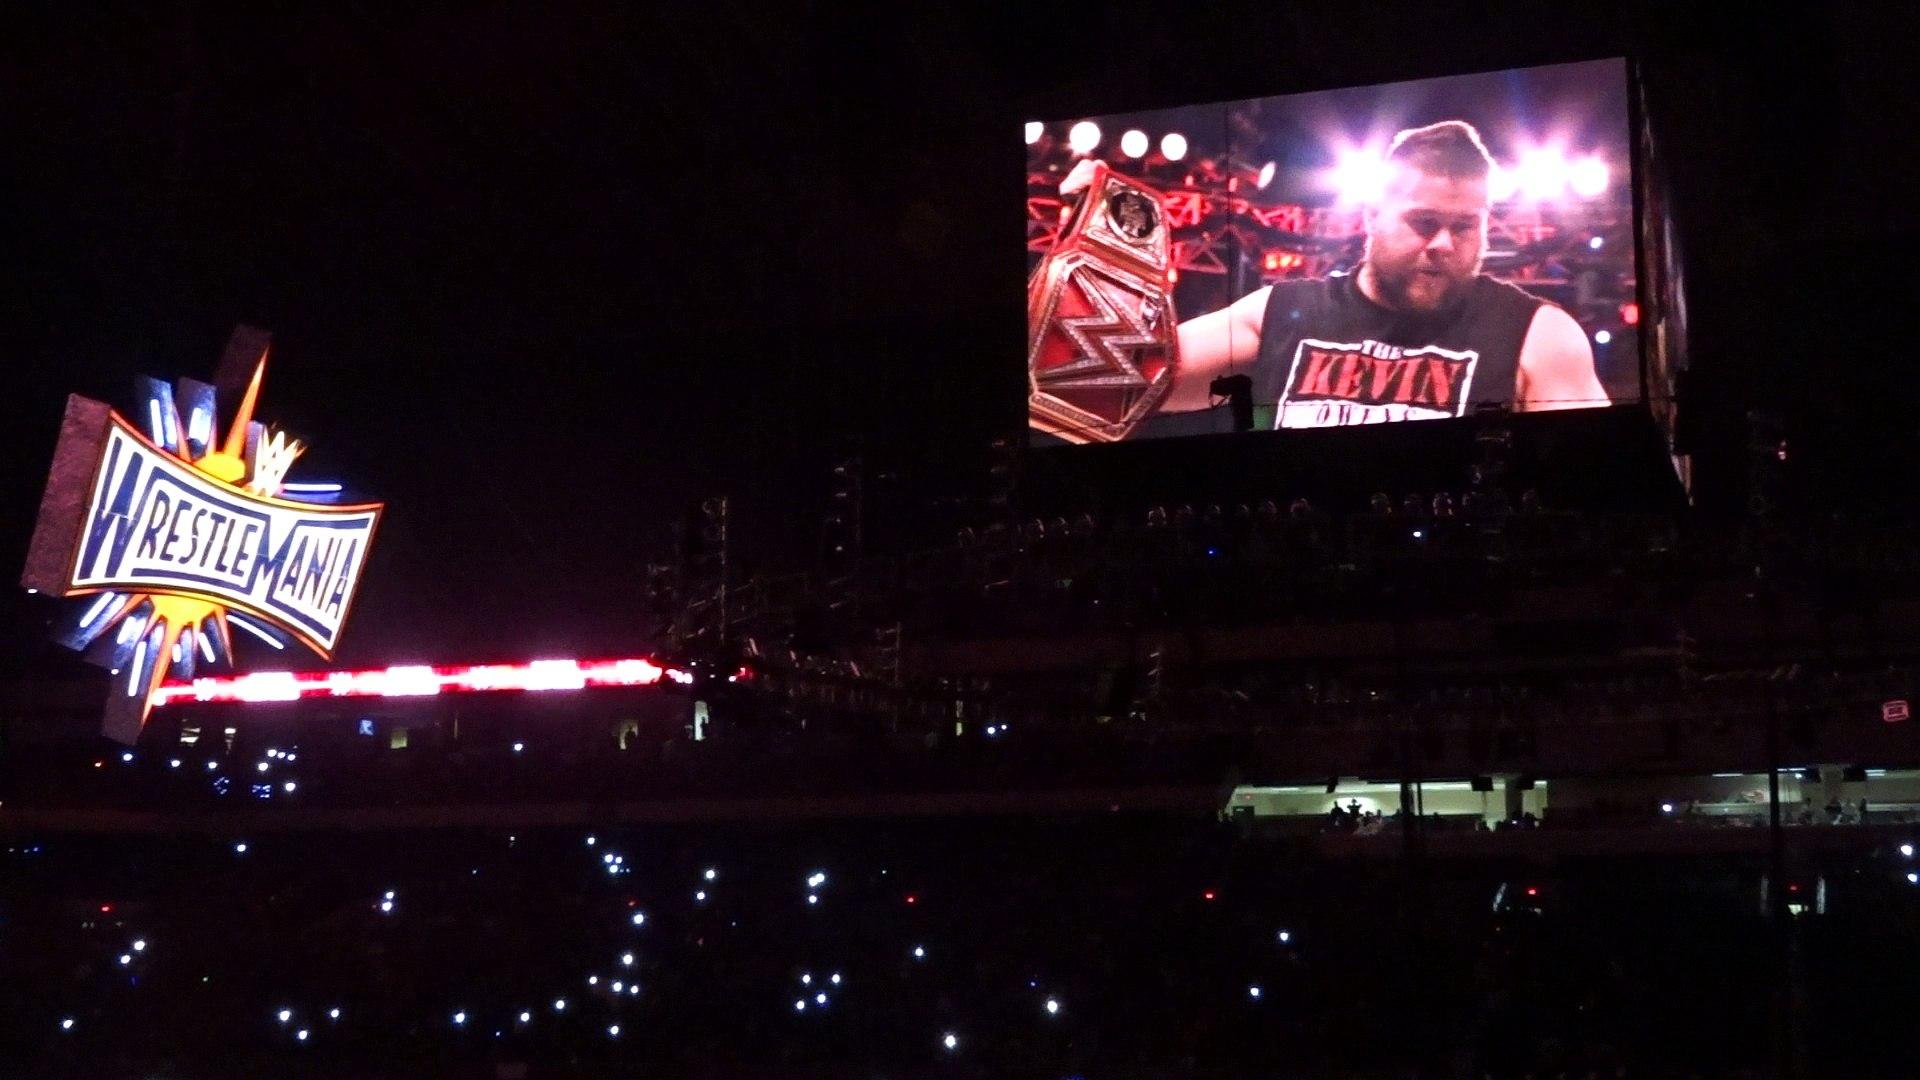 WWE Royal Rumble 2017 - PPV Opening Video Intro - Live San Antonio, TX